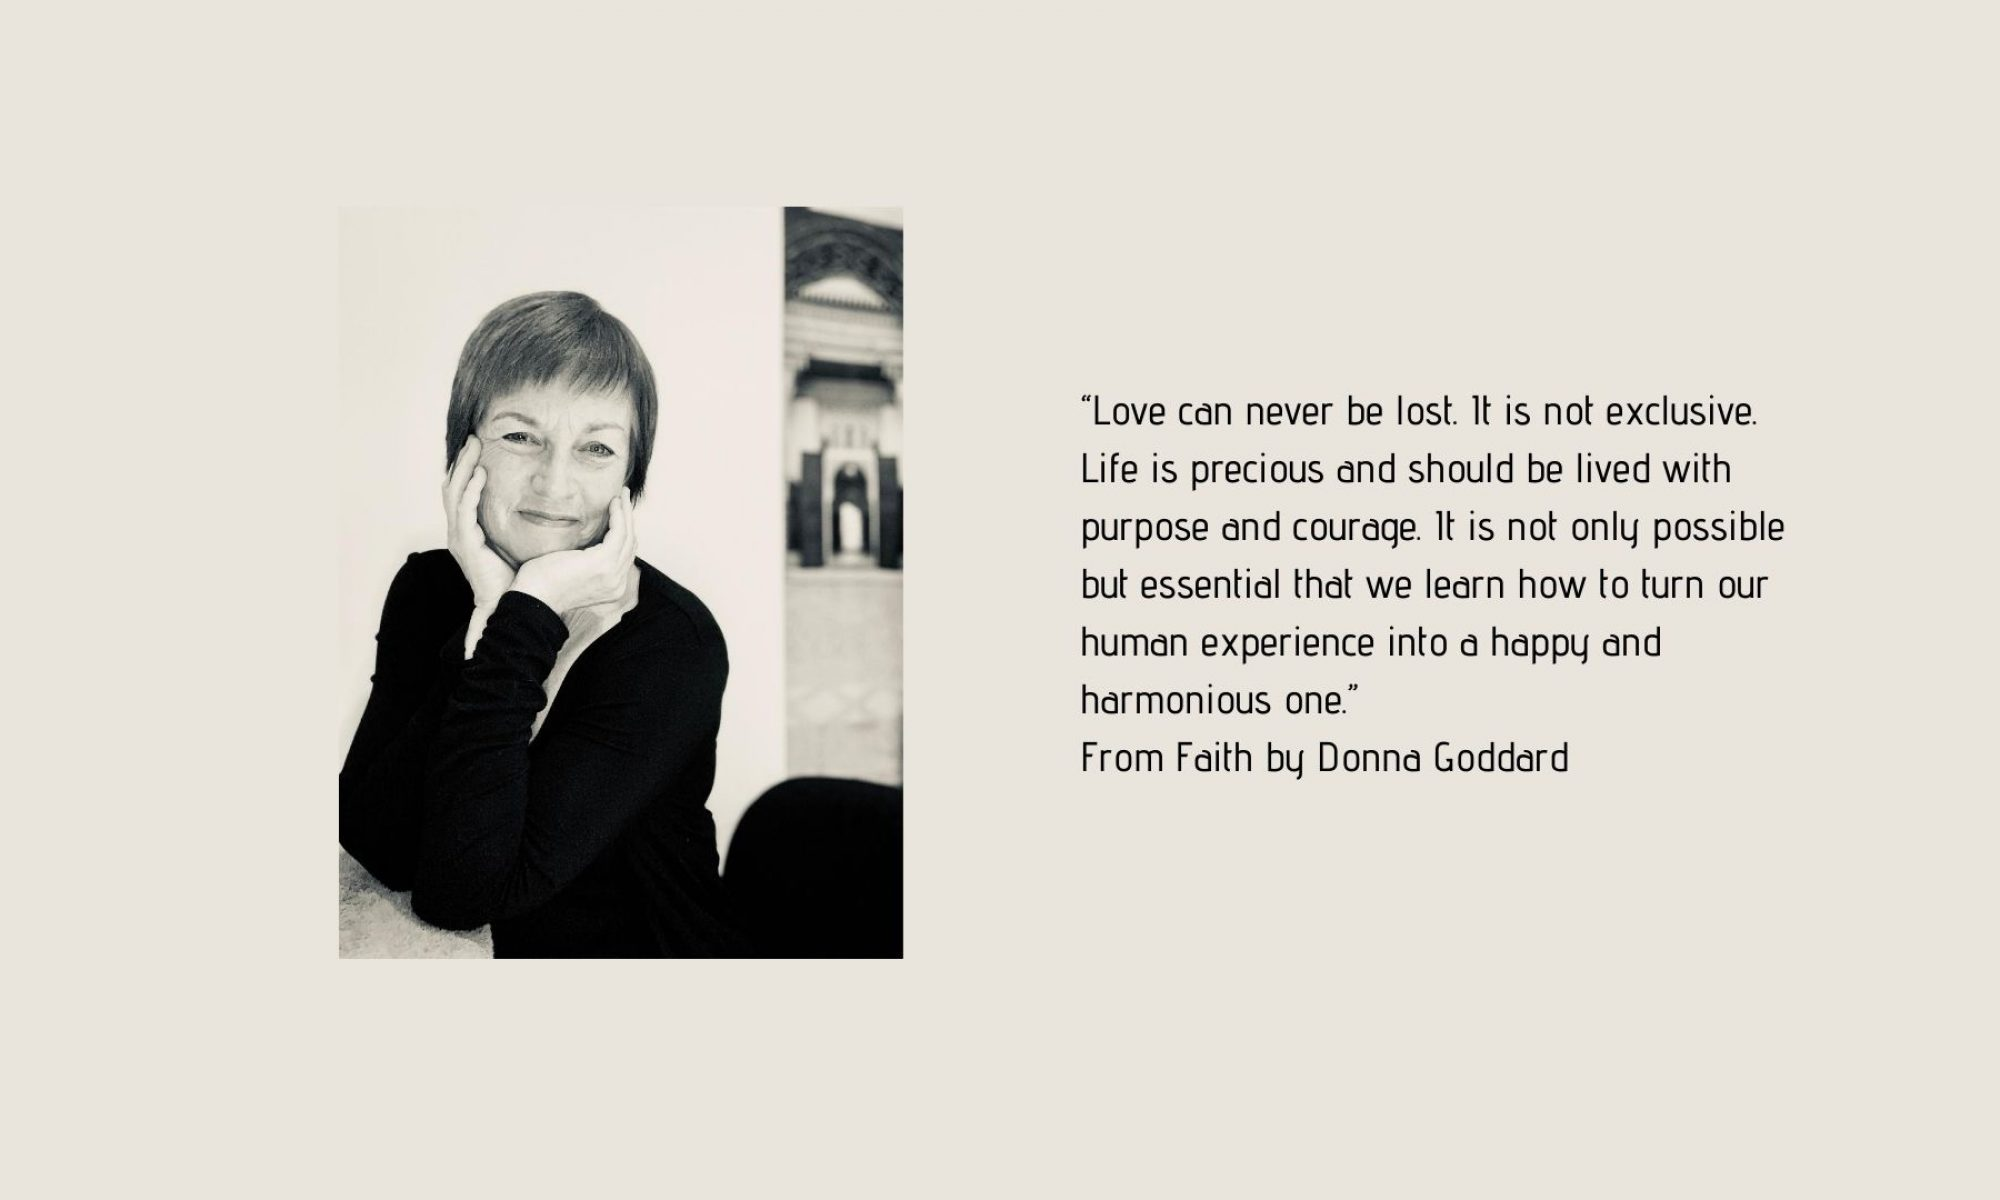 Donna Goddard